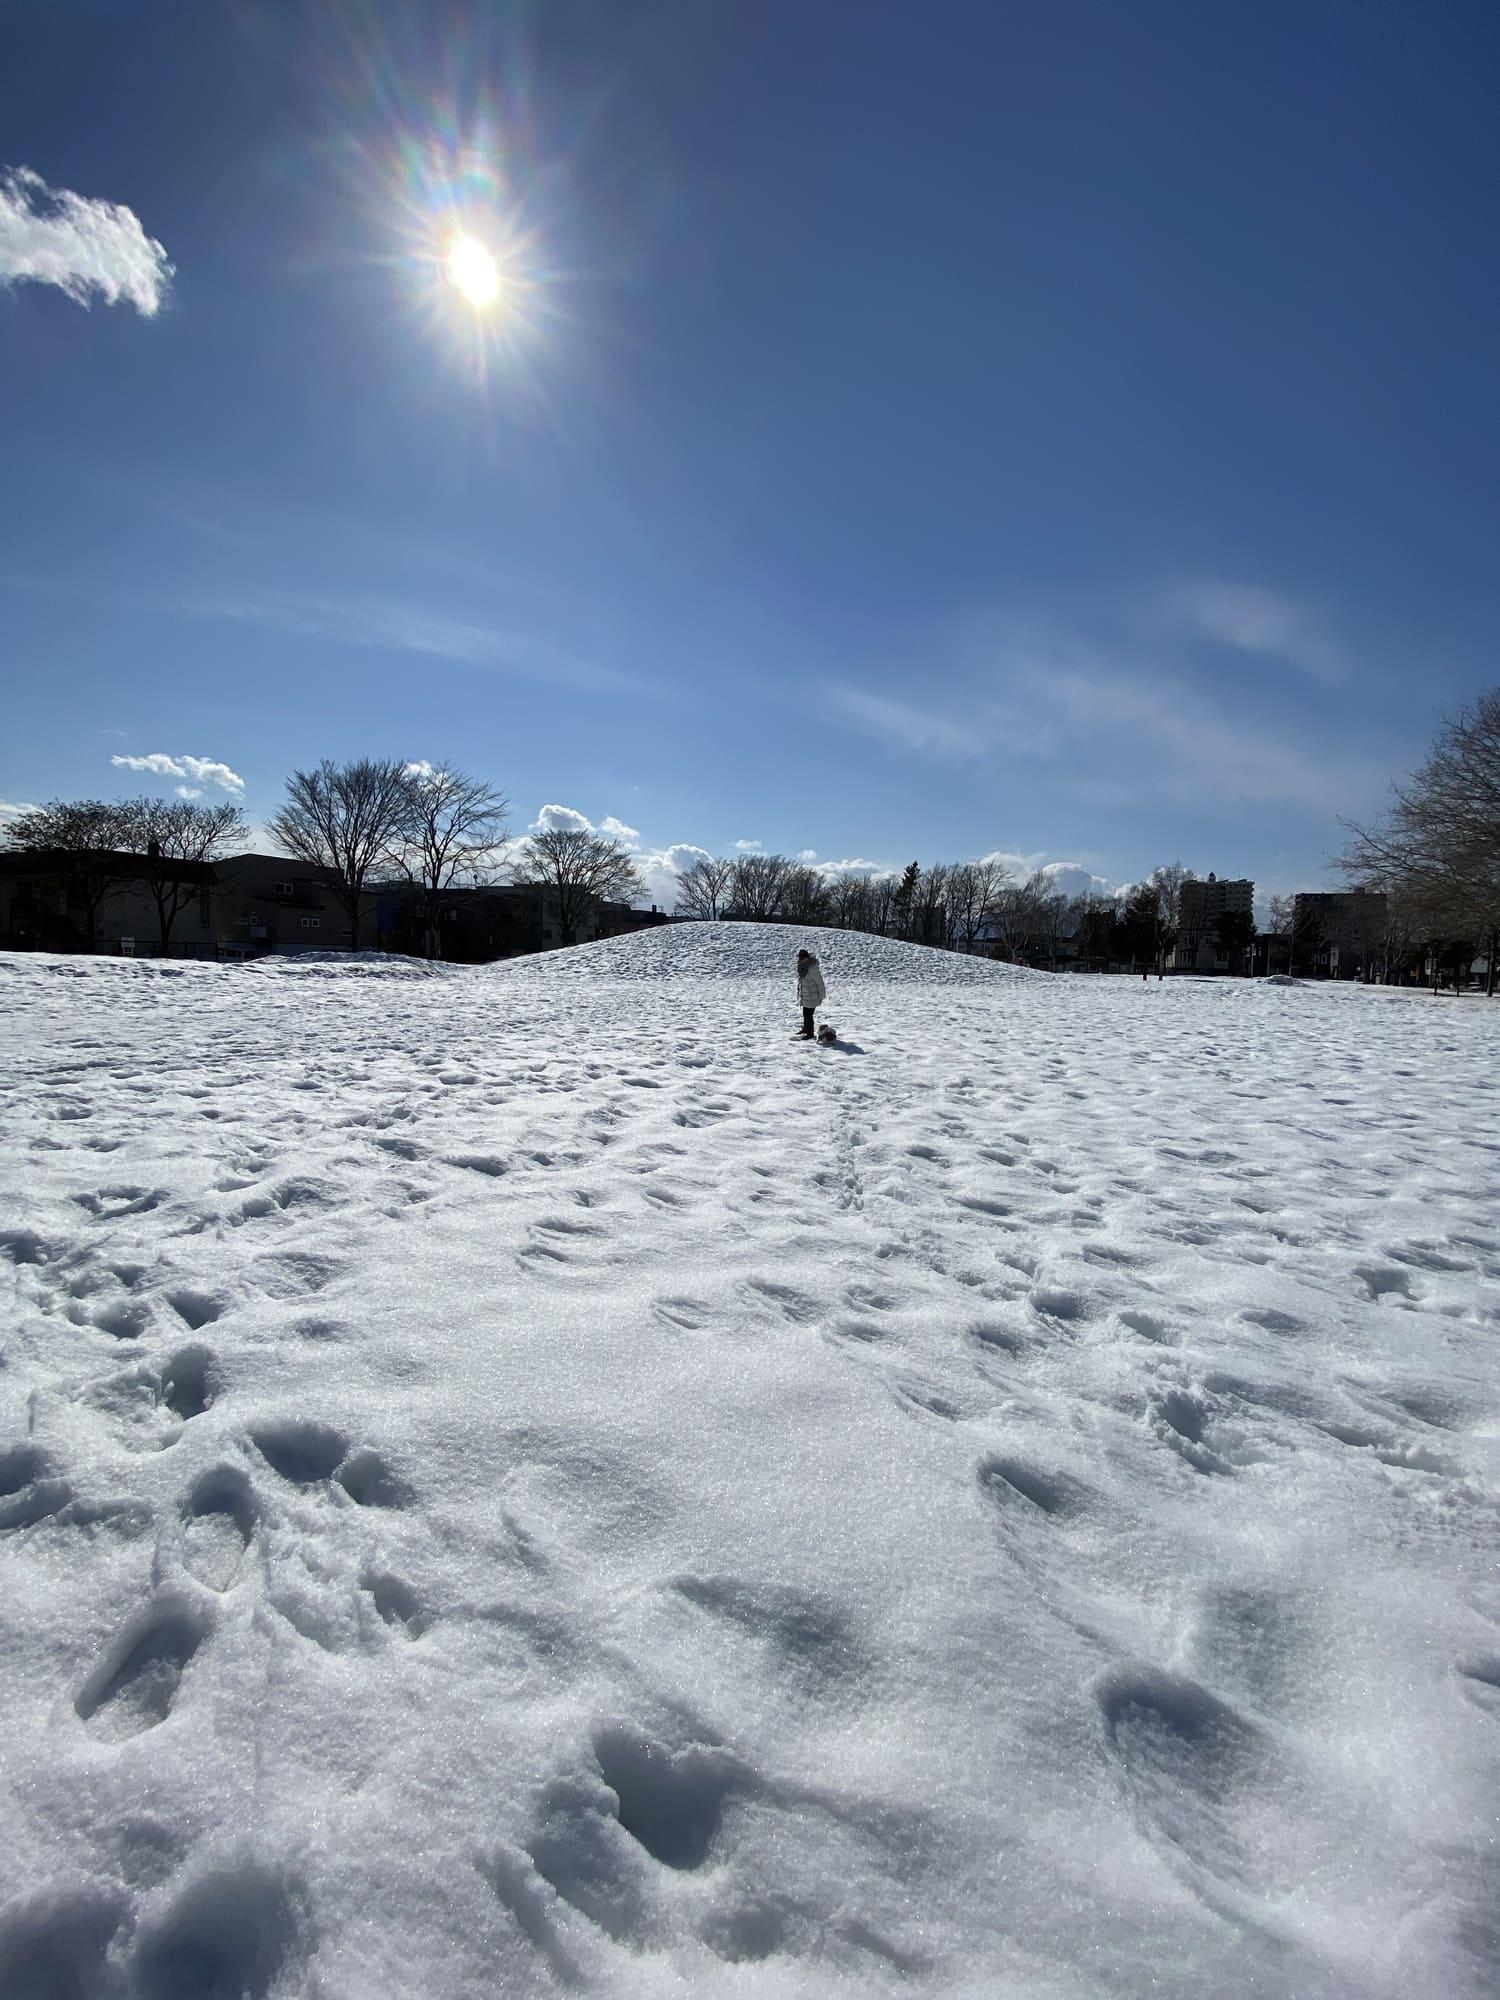 iPhone11で撮った雪景色